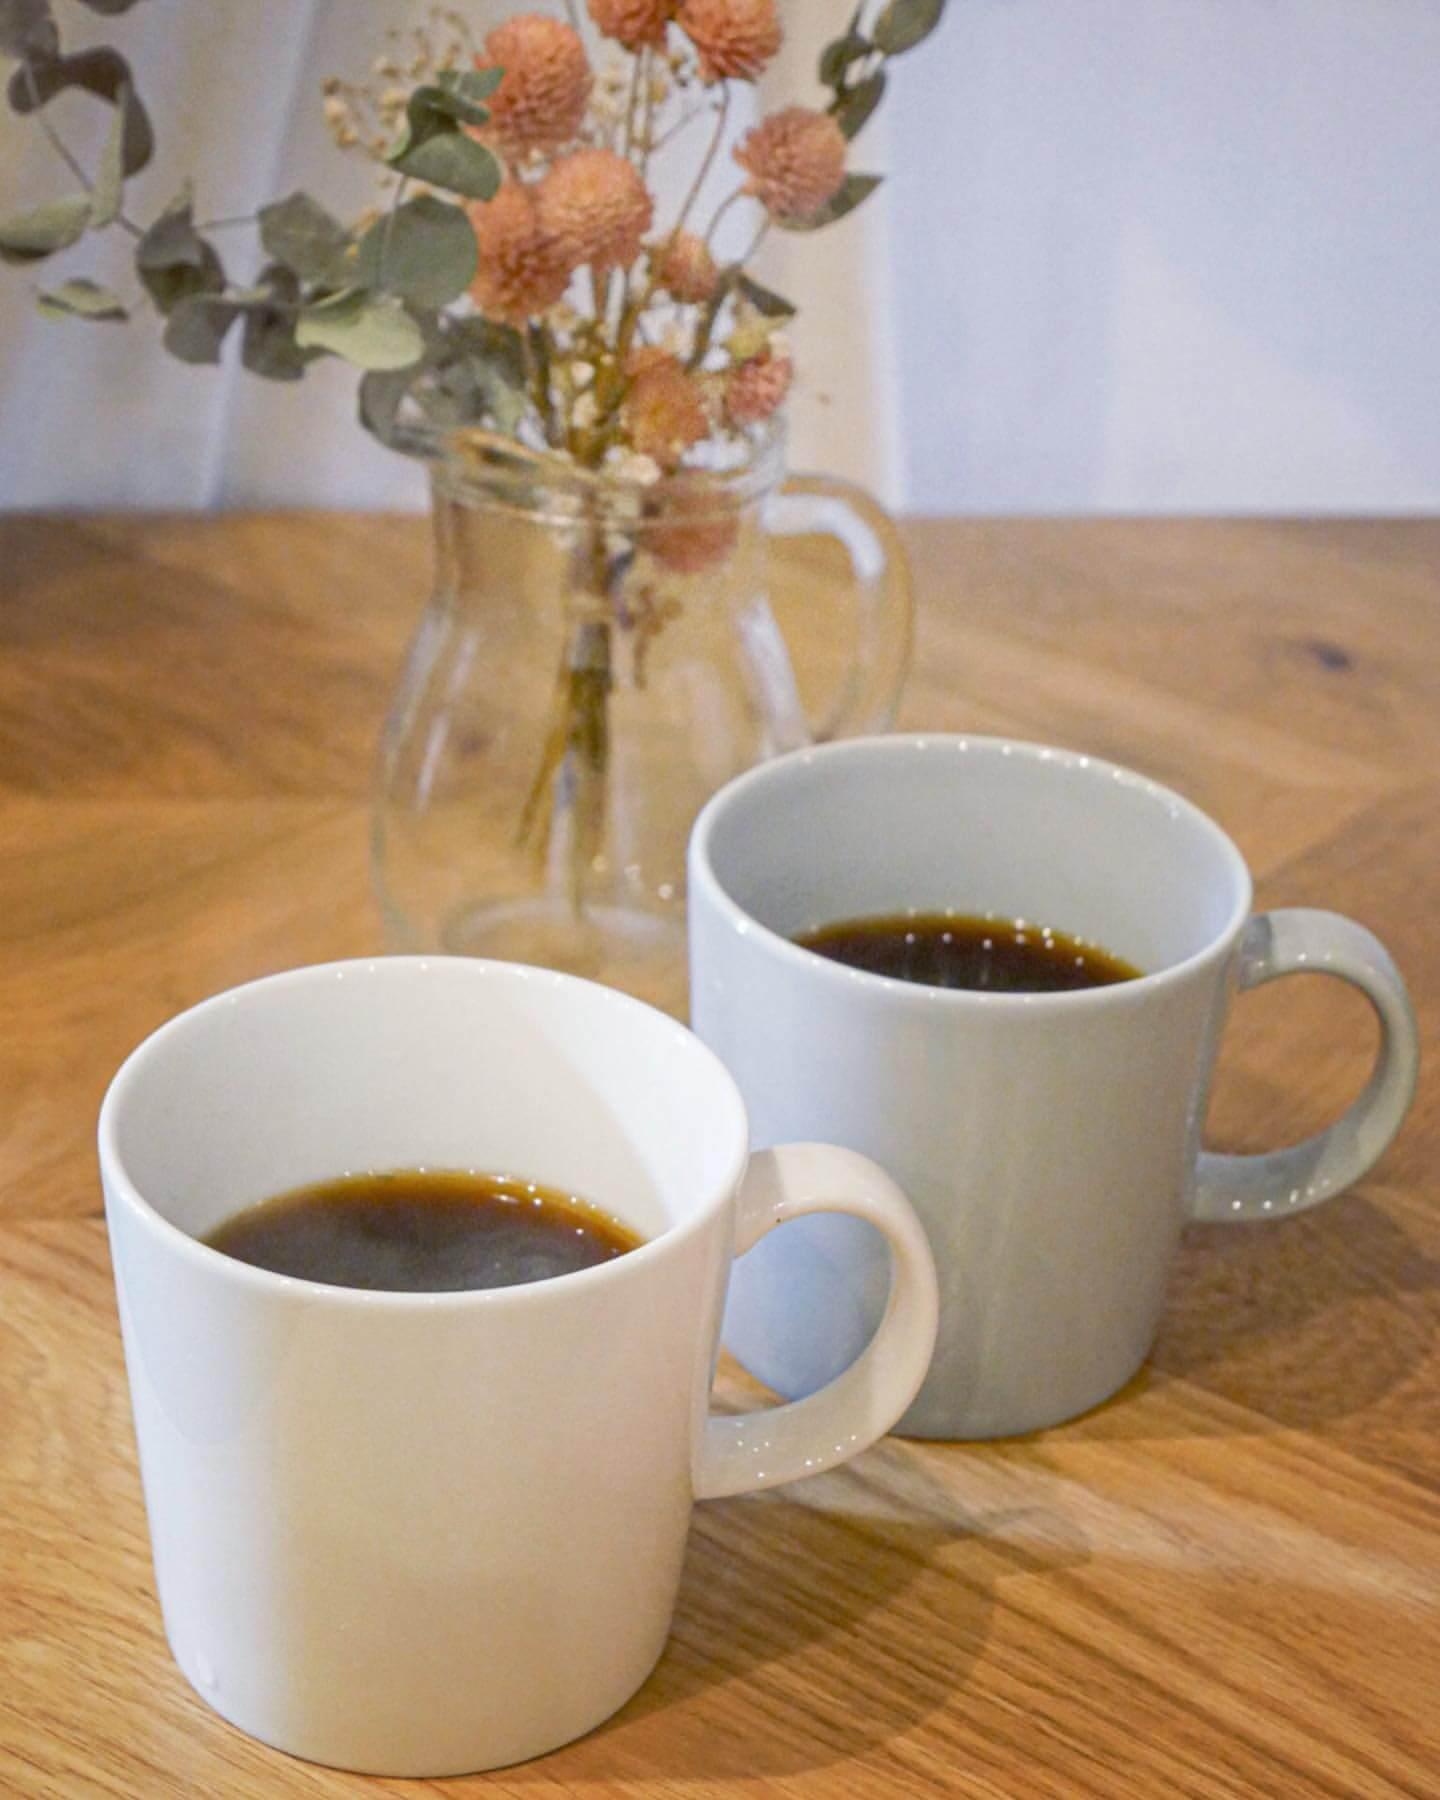 %e6%bb%8b%e8%b3%80%e7%9c%8c-%e3%82%ab%e3%83%95%e3%82%a7-shiga-cafe